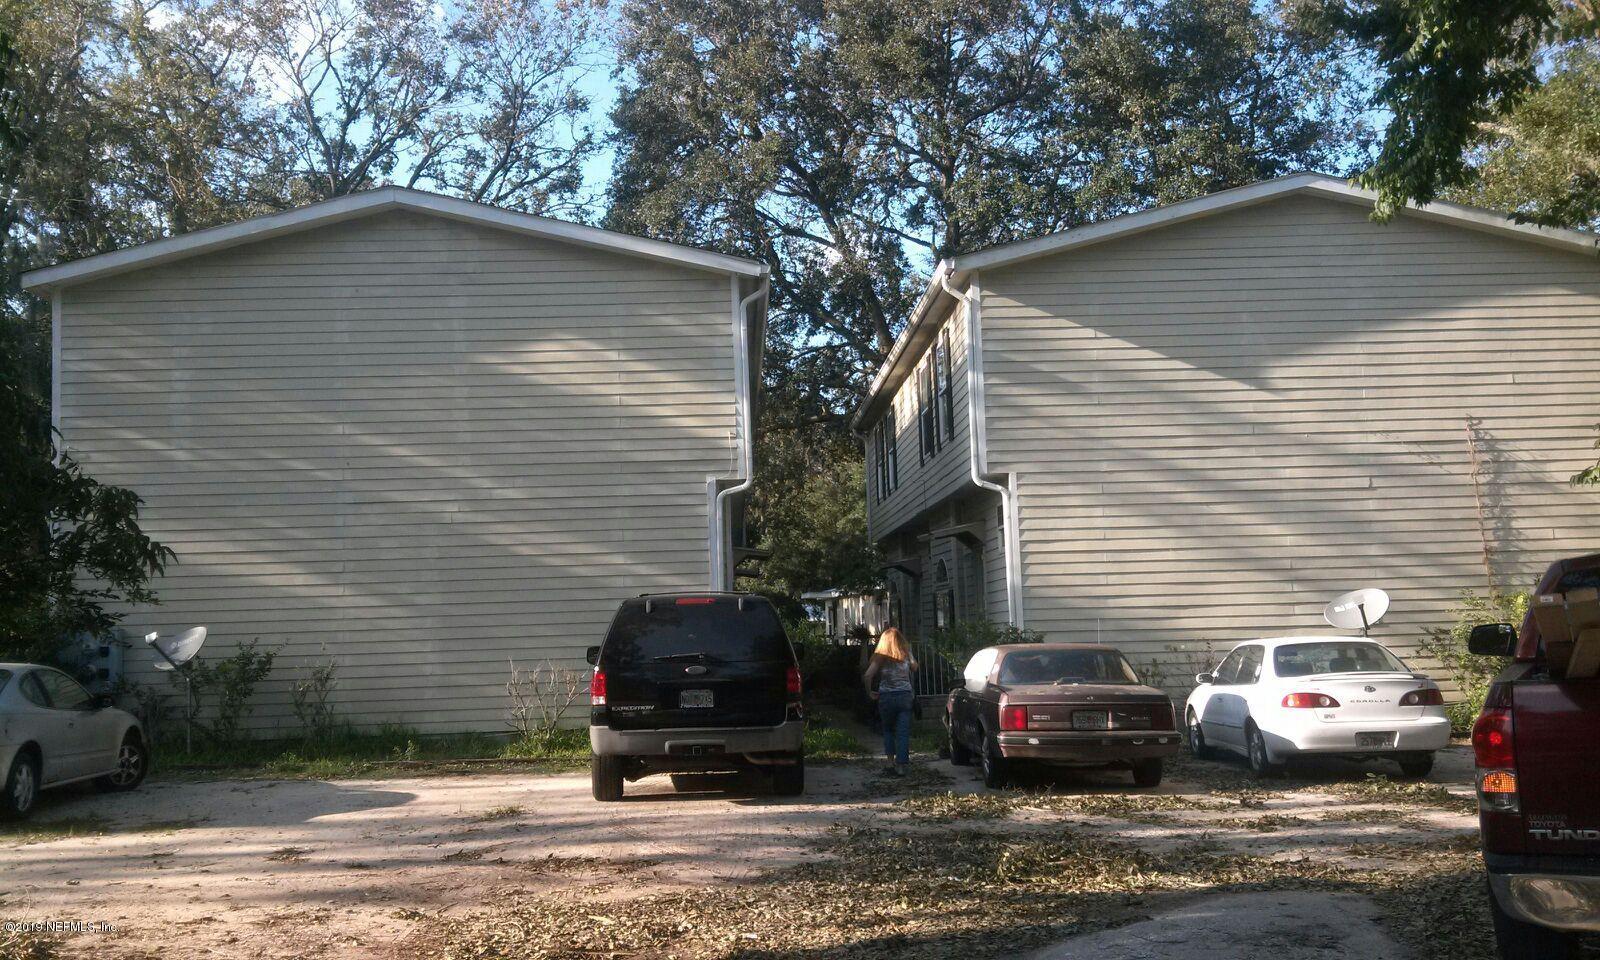 24 NESBIT- ST AUGUSTINE- FLORIDA 32084, 20 Bedrooms Bedrooms, ,14 BathroomsBathrooms,Residential Income,For sale,NESBIT,1010994